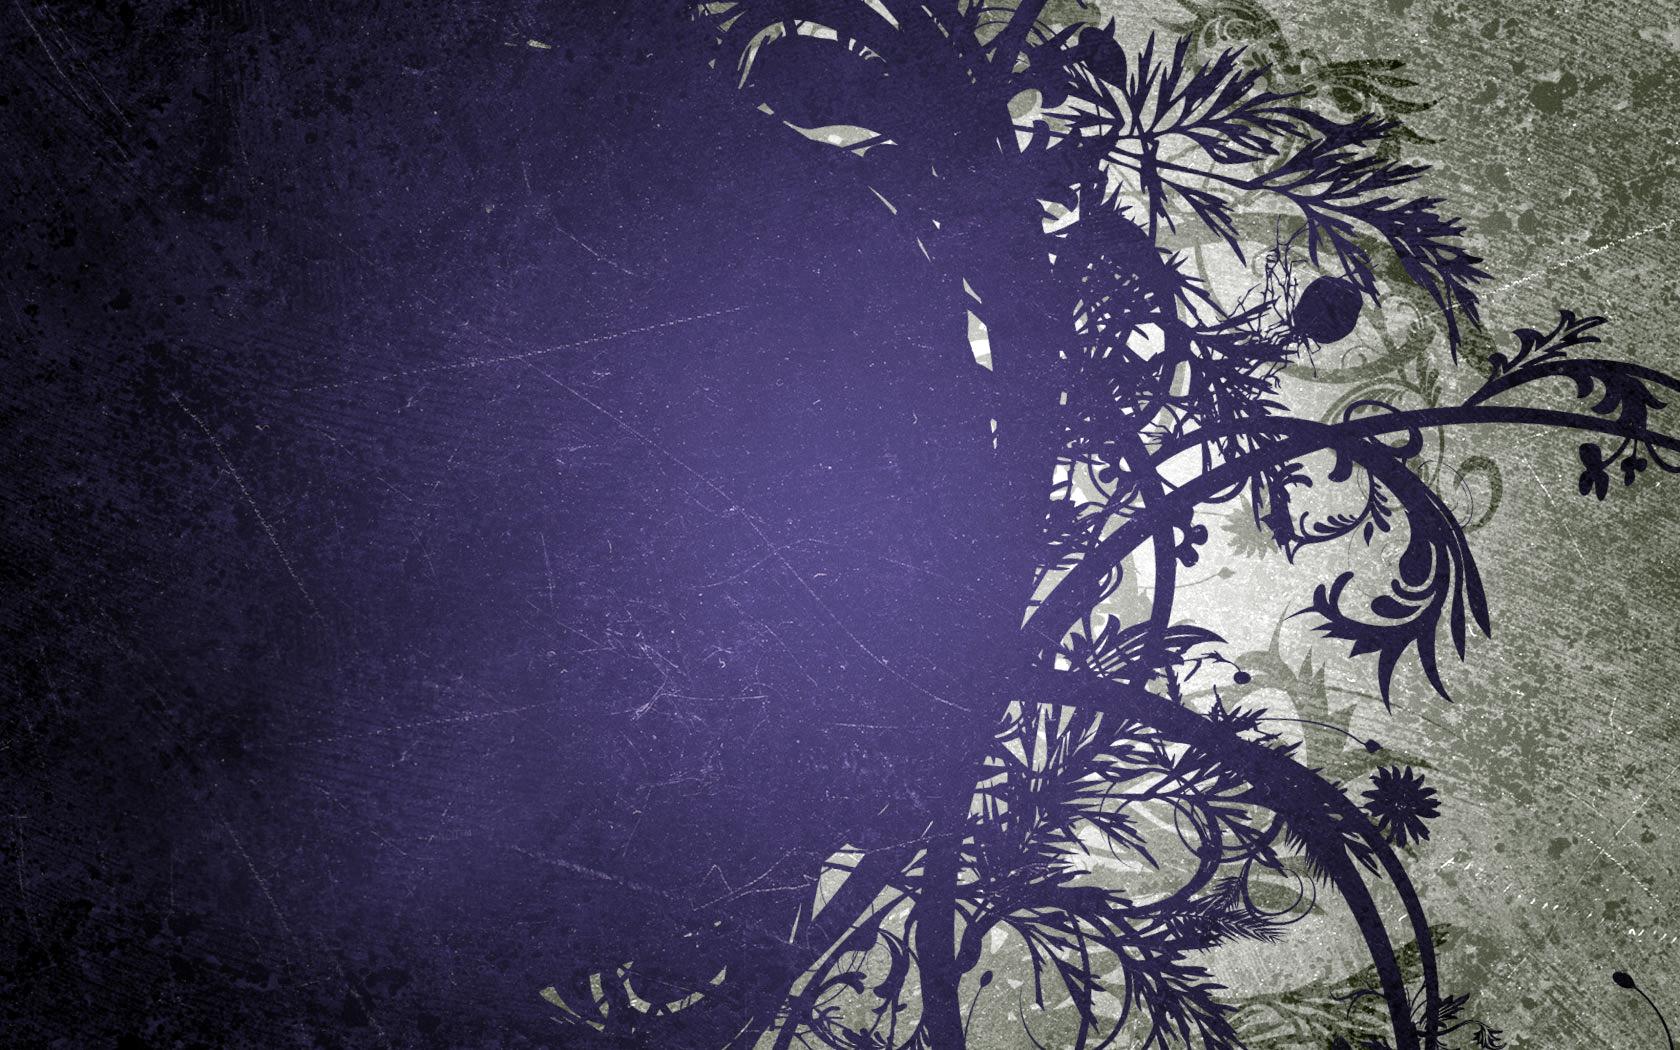 widescreen reaxion background deviantart - photo #37